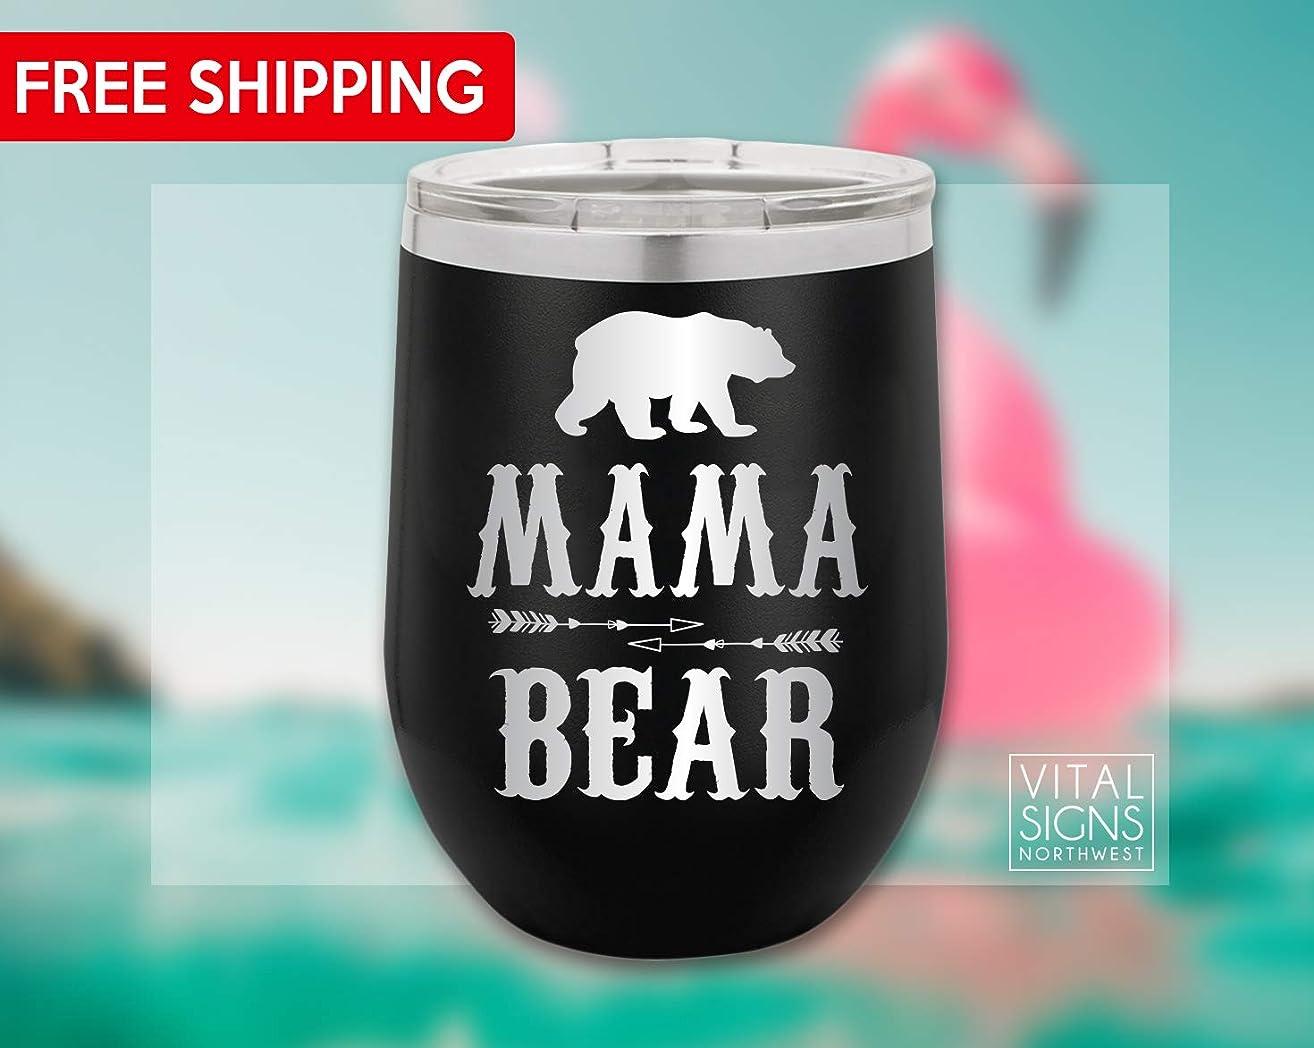 Mama Bear, Mama bear Wine Tumbler, Wine Tumbler, Mother's Day, Christmas, gifts for her, Coffee mug, Travel mug